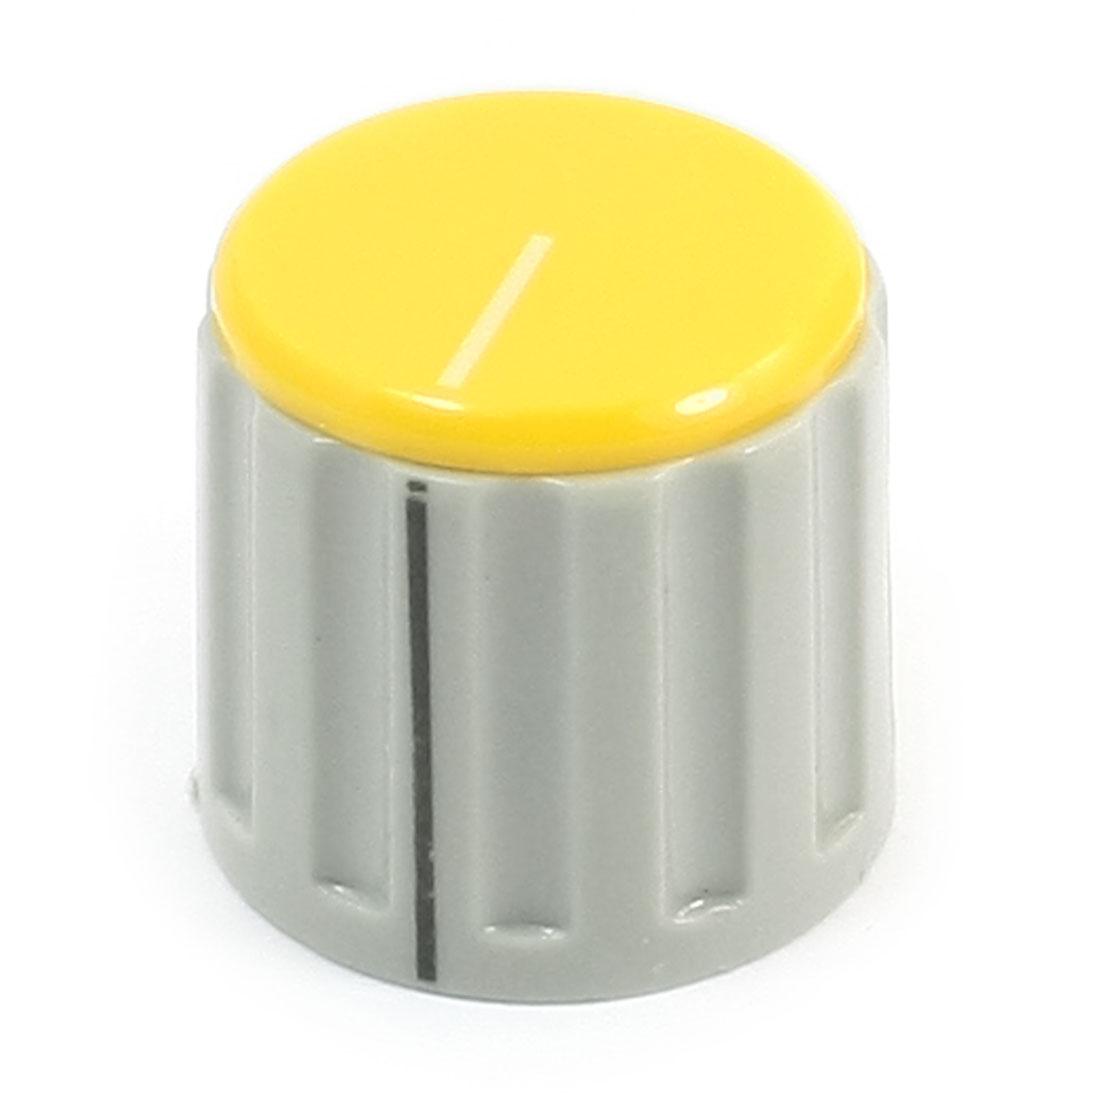 6mm Split Shaft Yellow Cap Stereo Radio Taper Potentiometer Volume Knob KN115